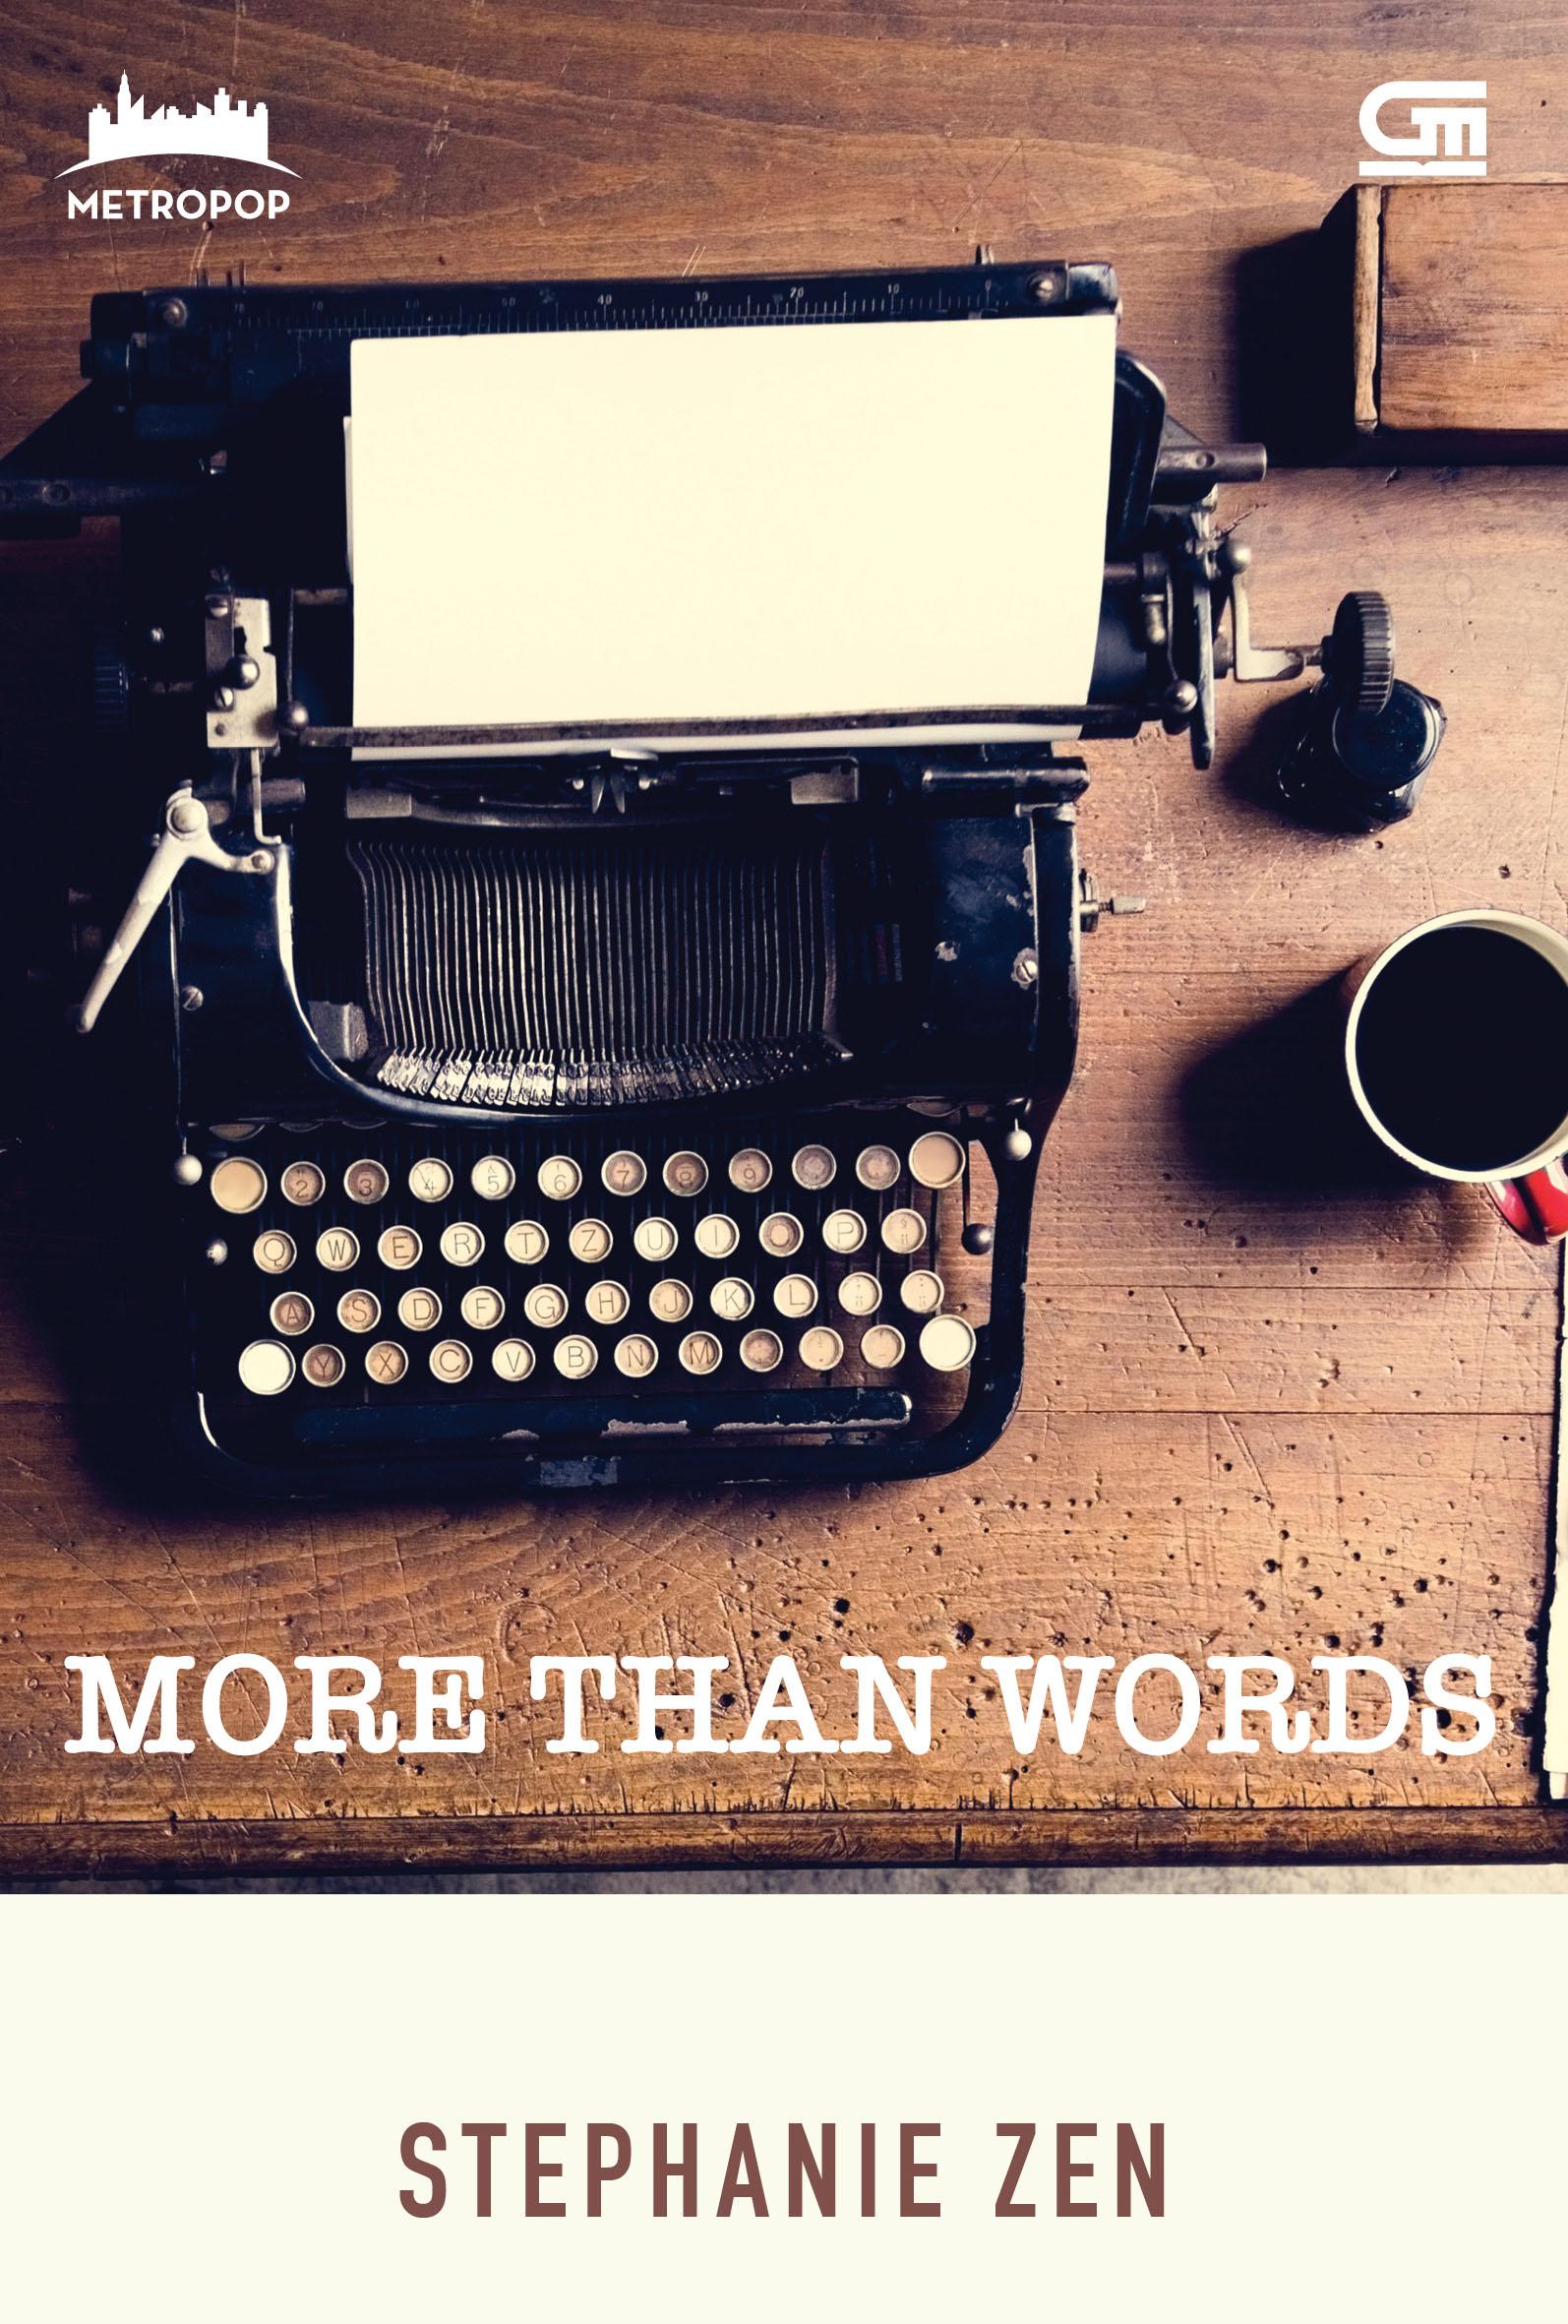 MetroPop: More Than Words